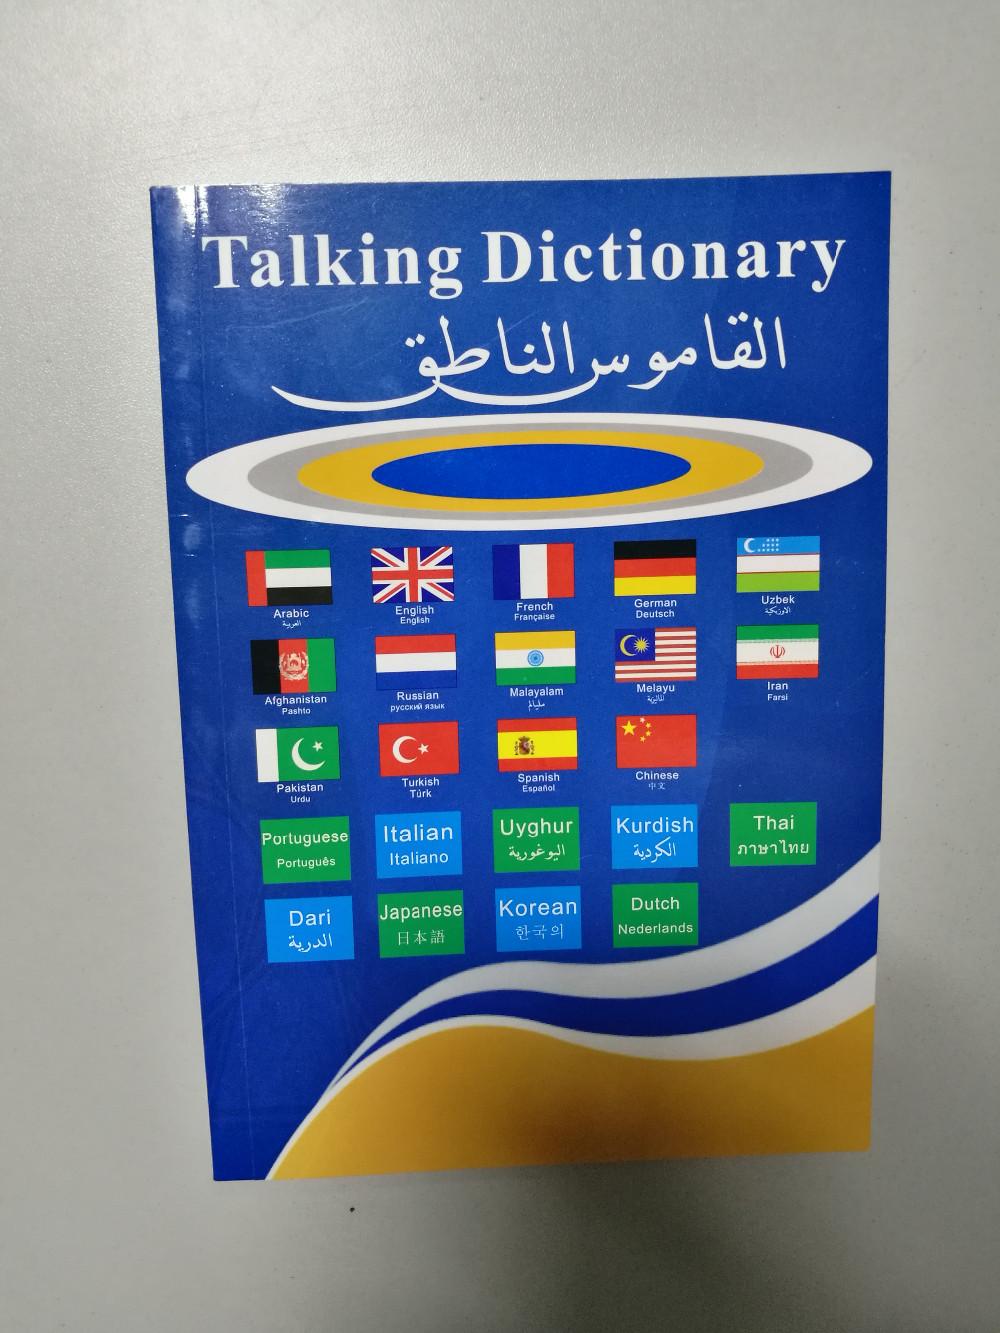 Holy Al Quran Mp3 Player Tilawat Quran Read Pen English To Urdu Translation  Dictionary Download - Buy English To Urdu Translation Dictionary